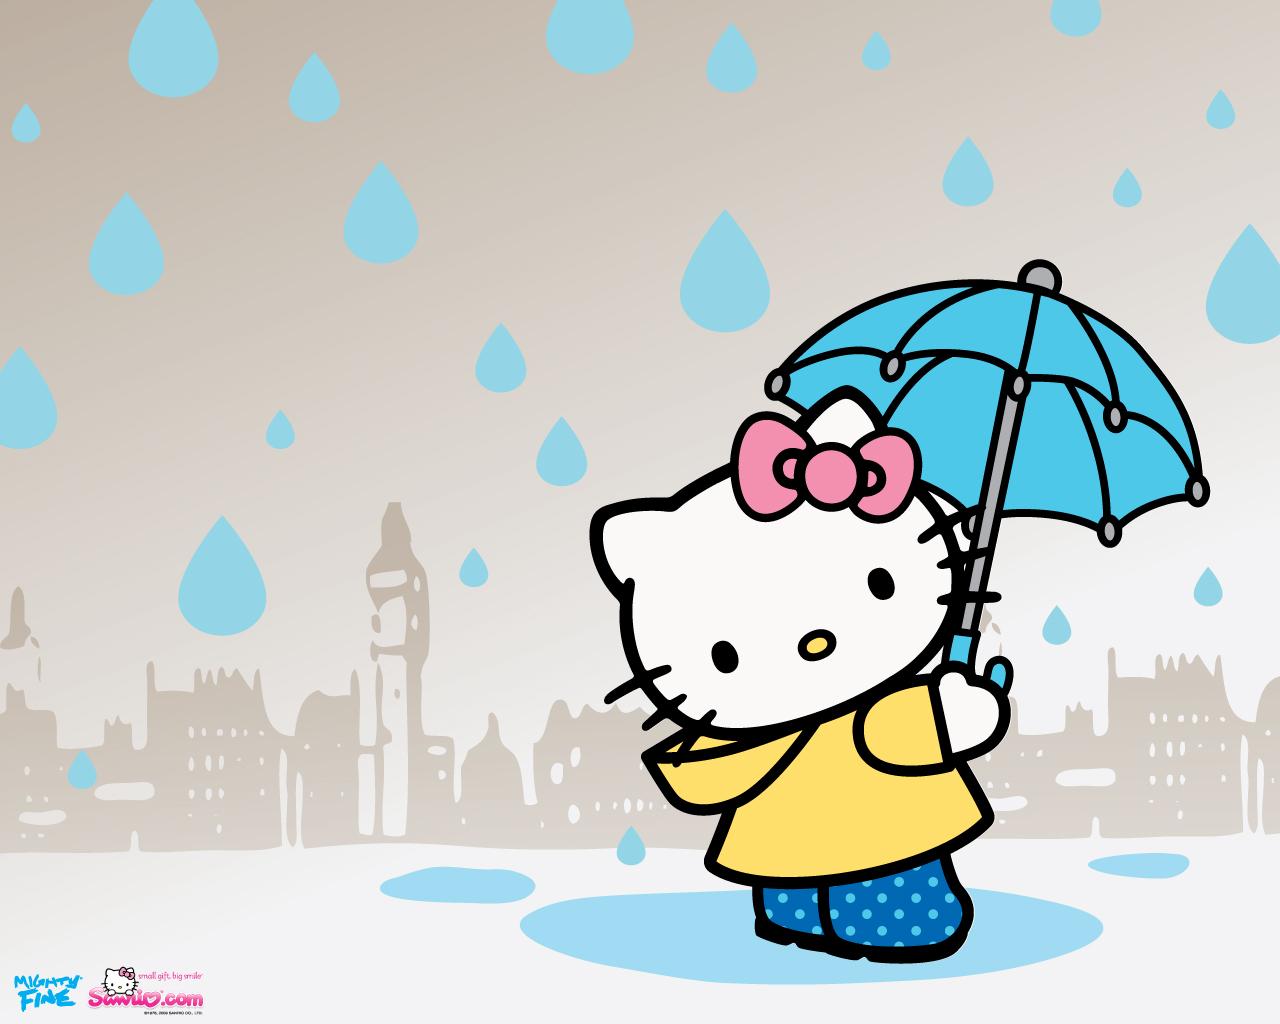 Download Wallpaper Hello Kitty Peach - Hello-Kitty-Wallpapers-014  Snapshot_756736.jpg